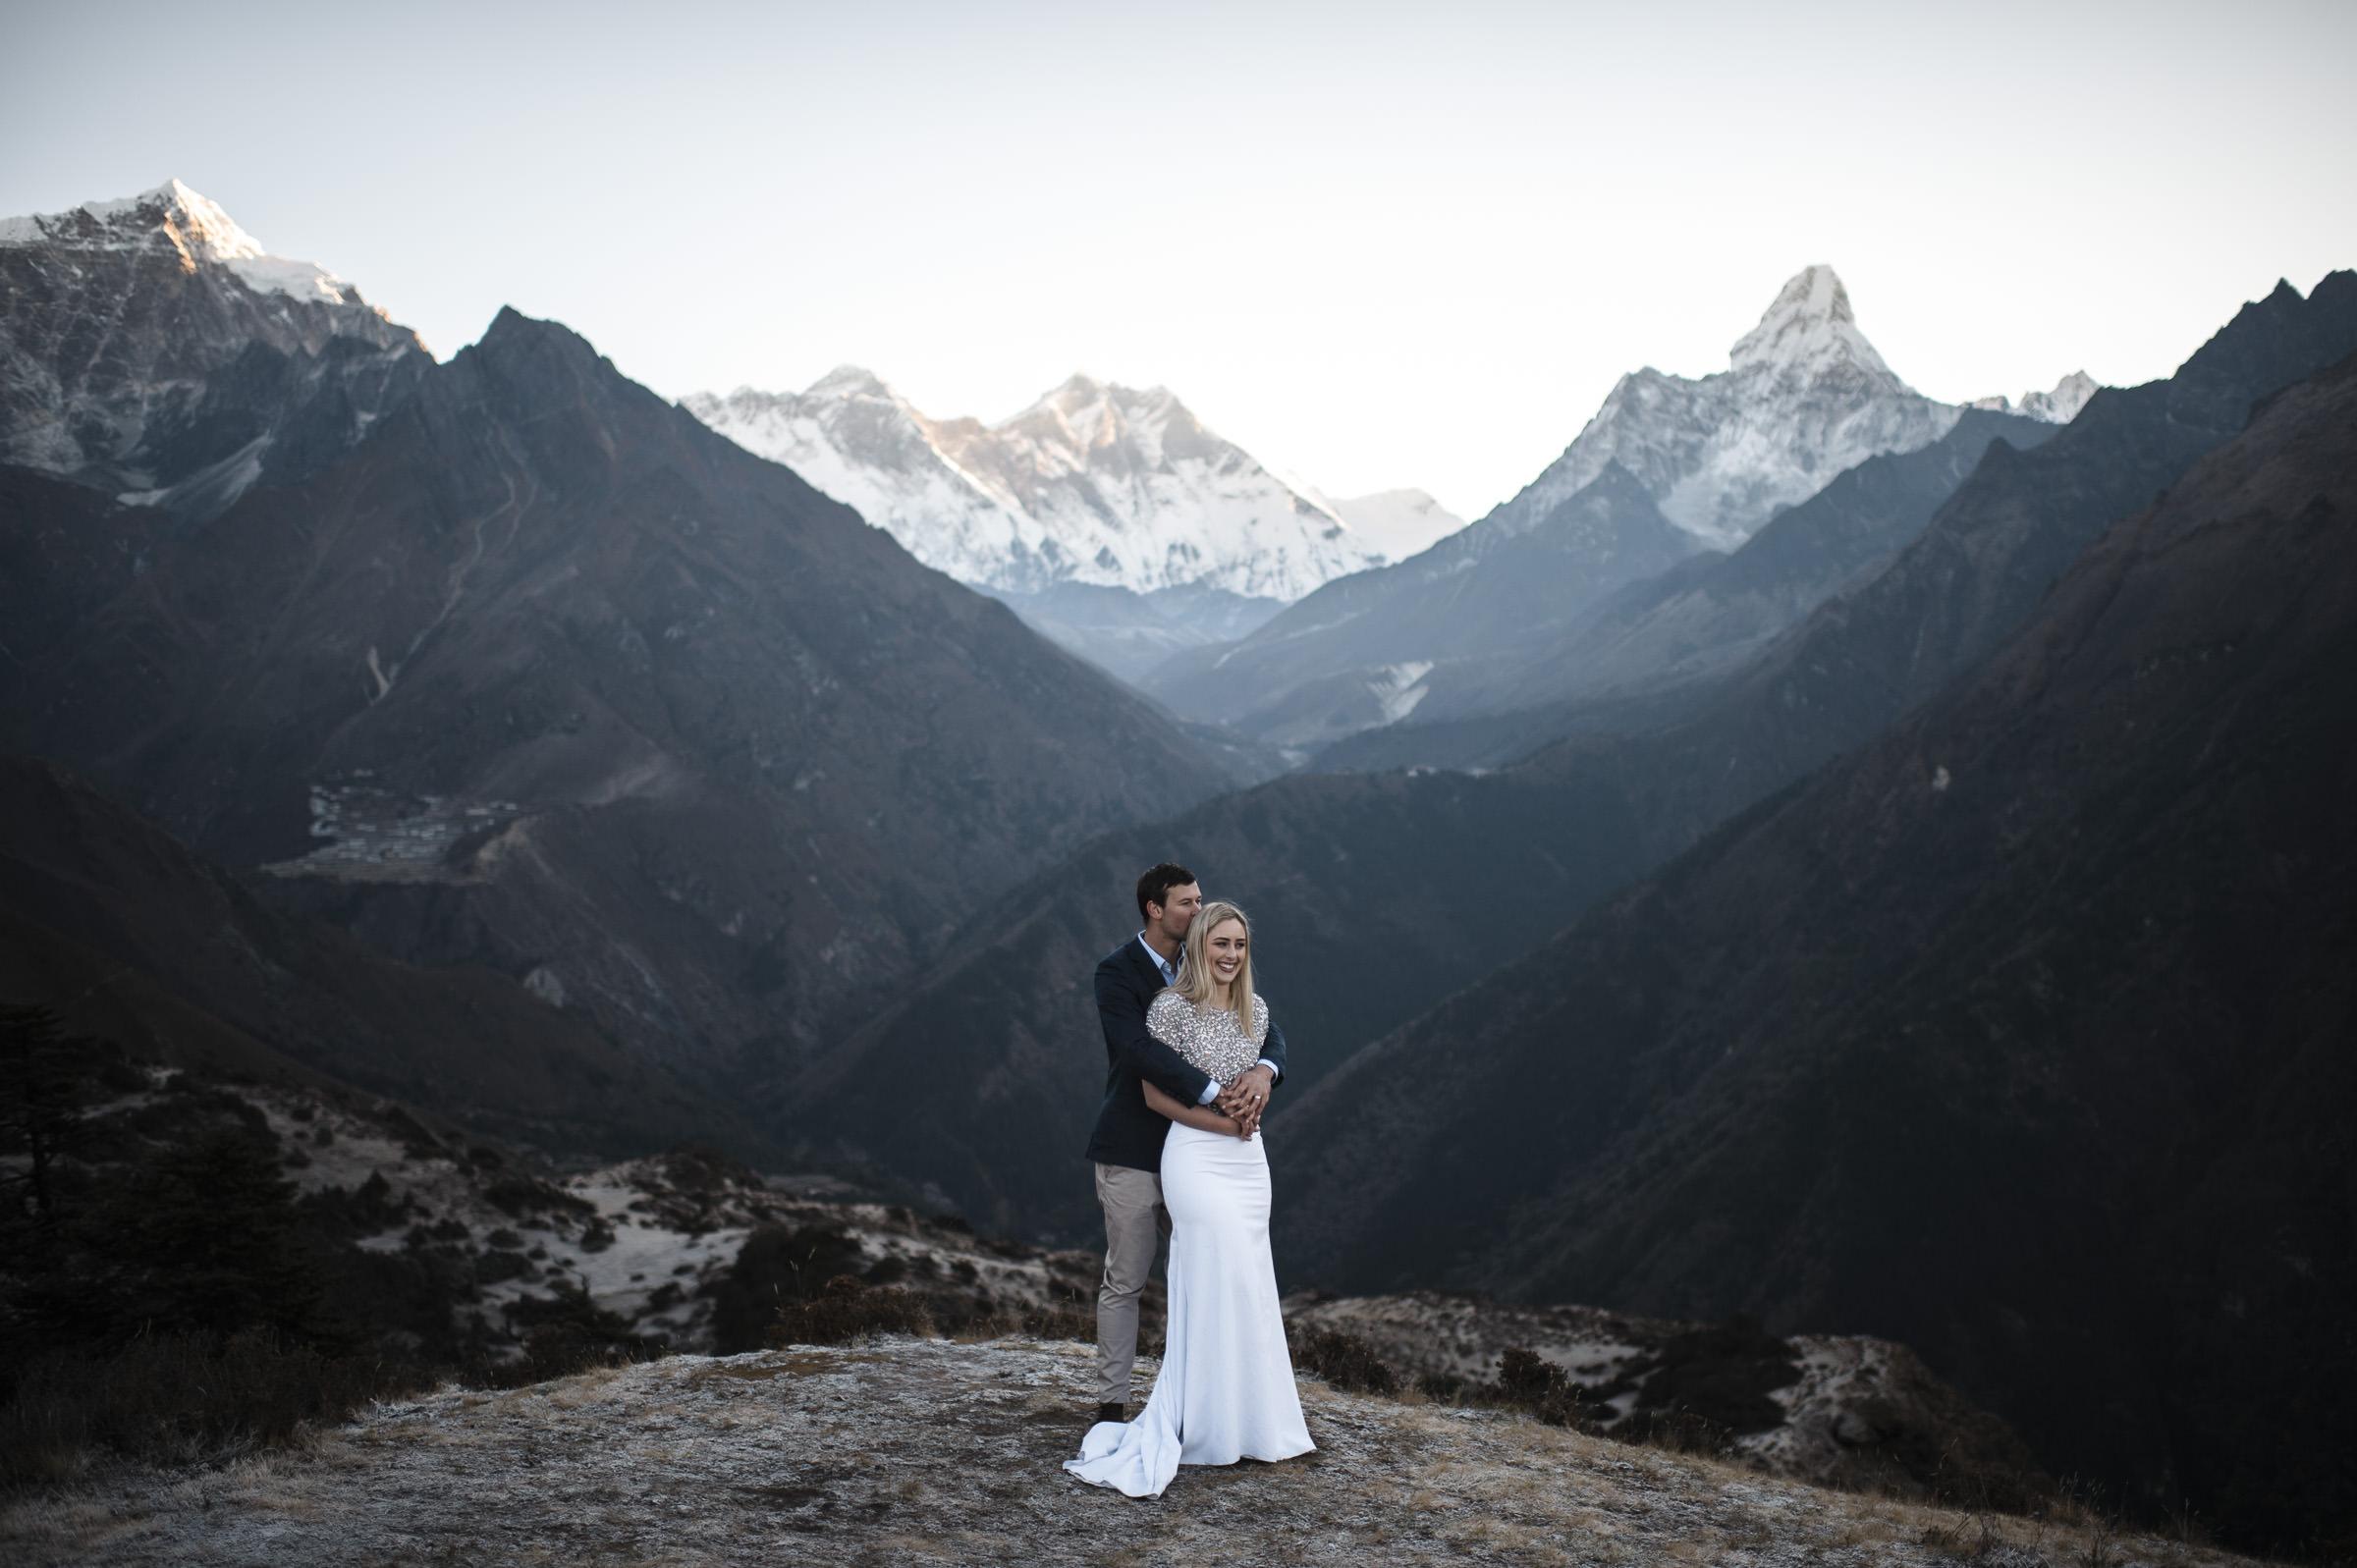 Ash_Dan_Nepal_ELOPEMENT_DAY_MORNING_Blog-39.jpg